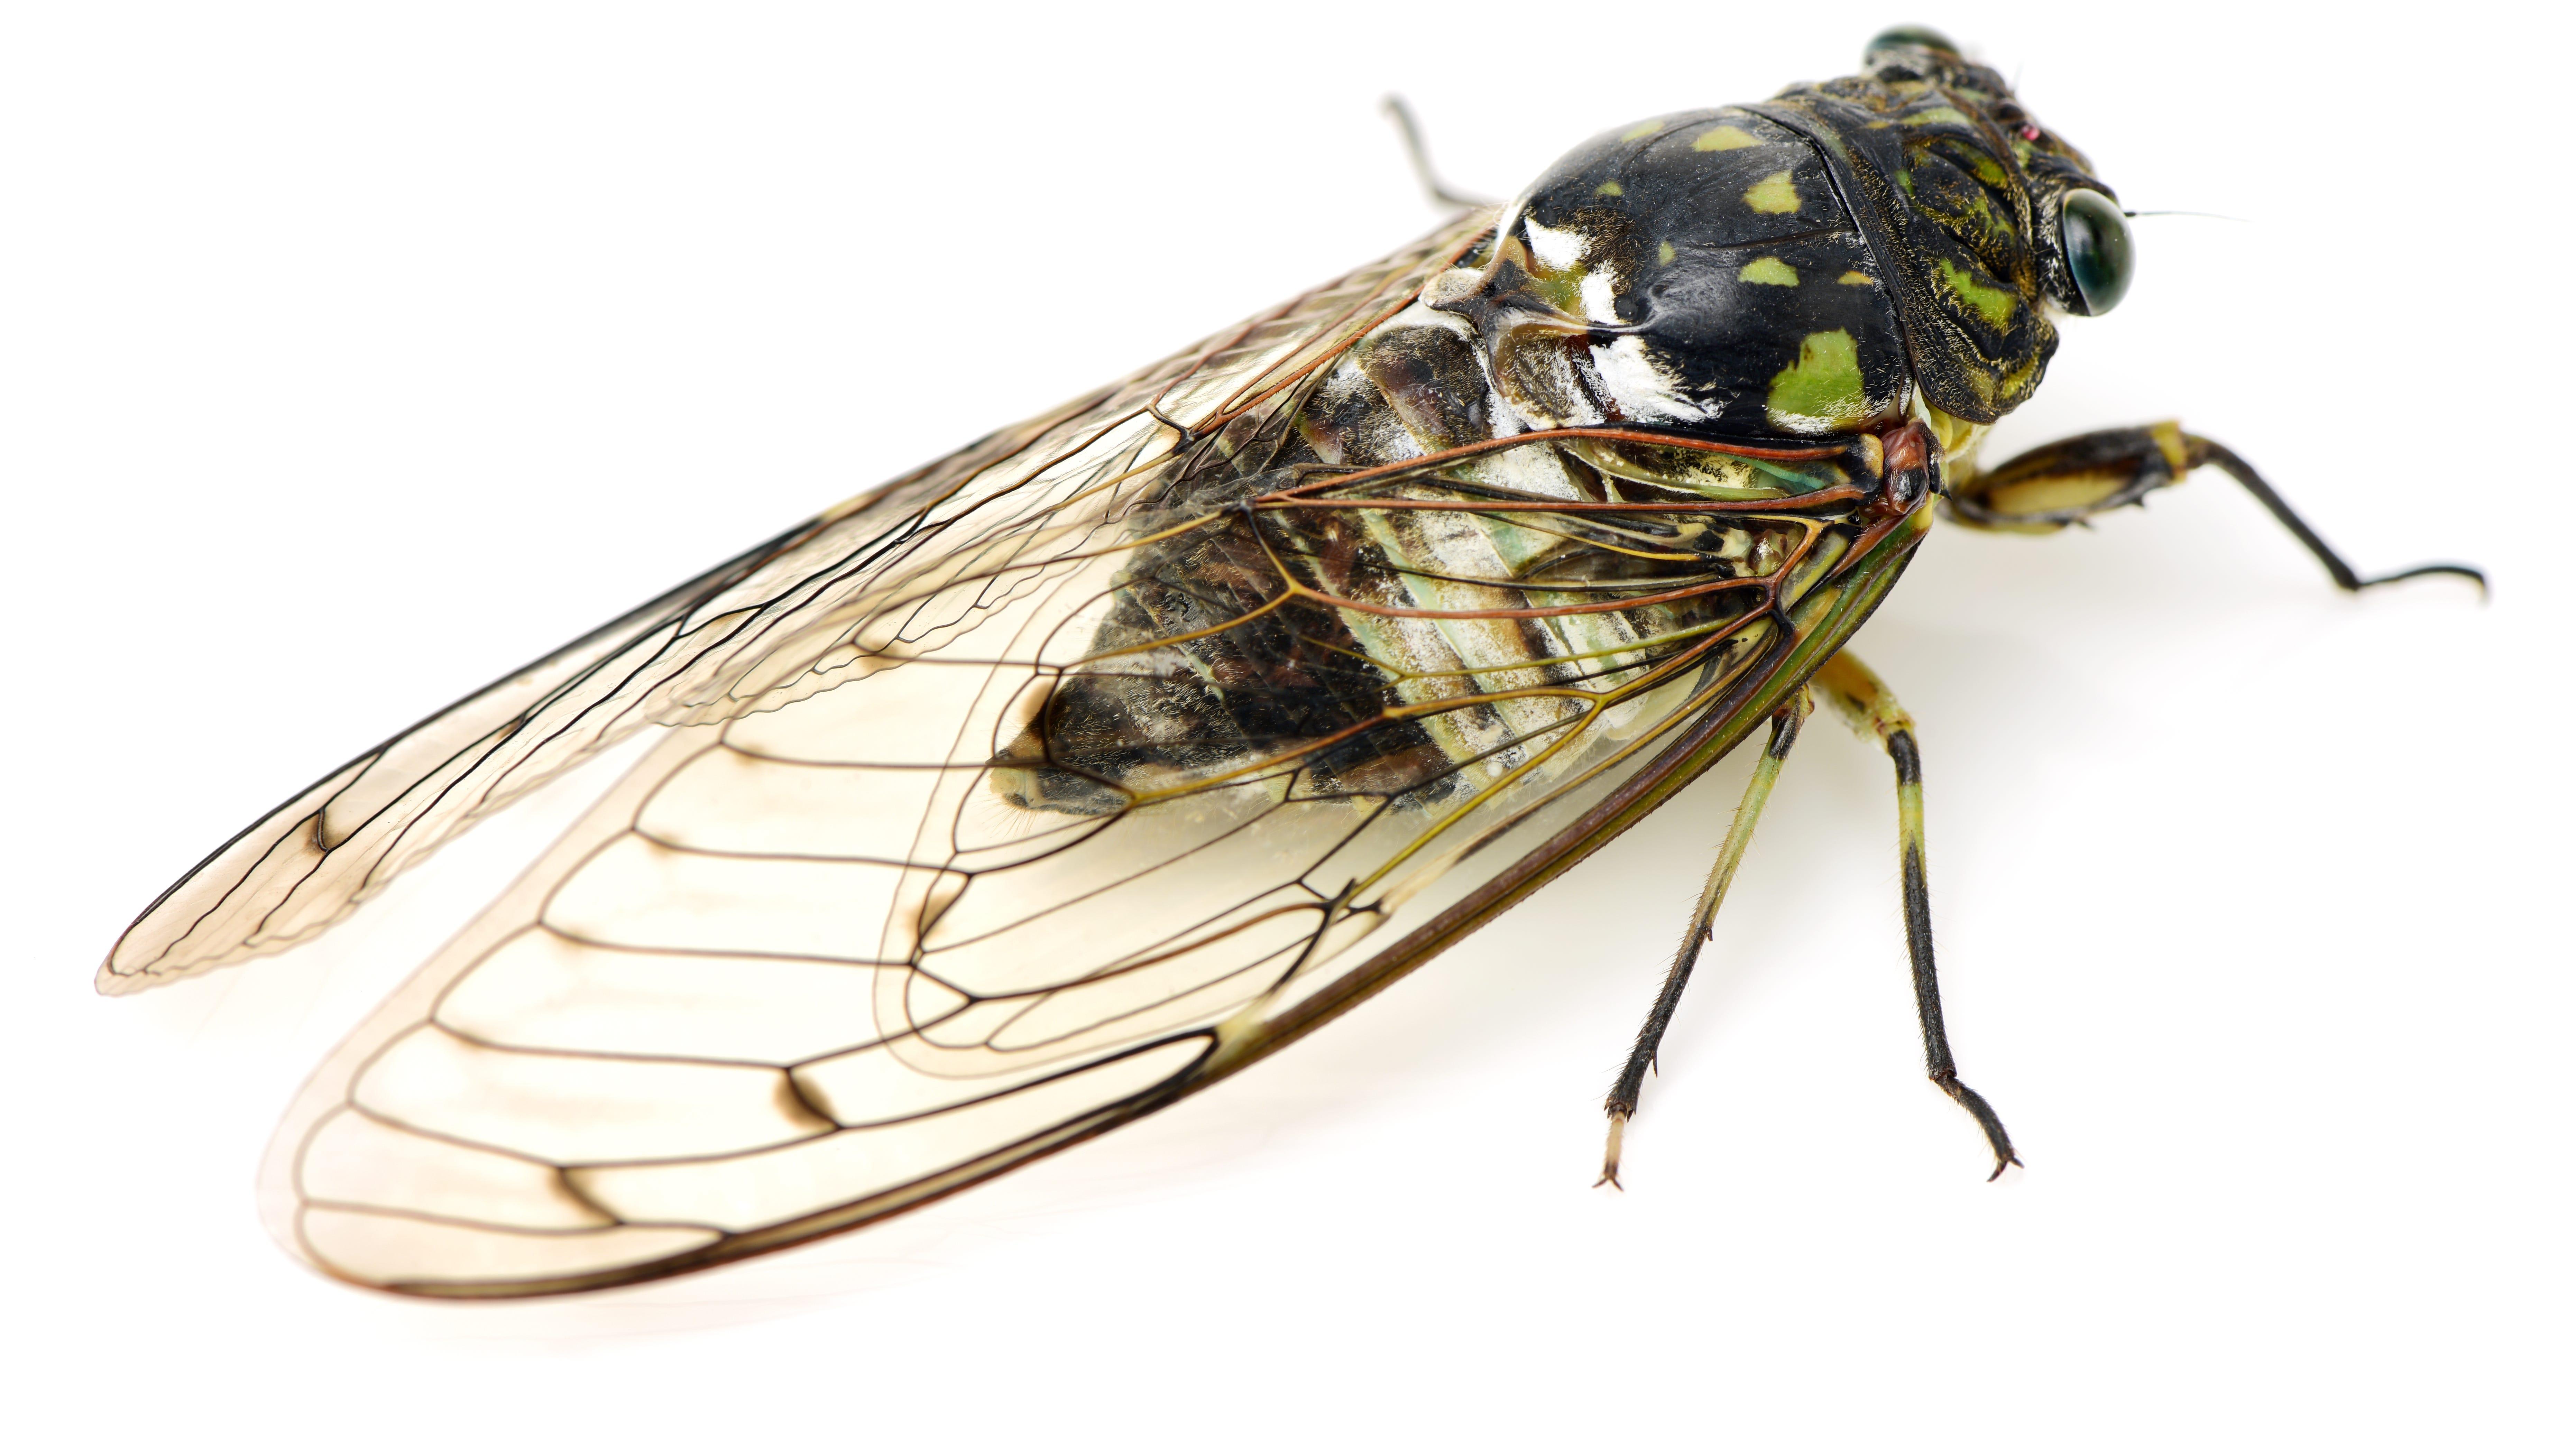 'Amorous' cicada causes serious car crash: police